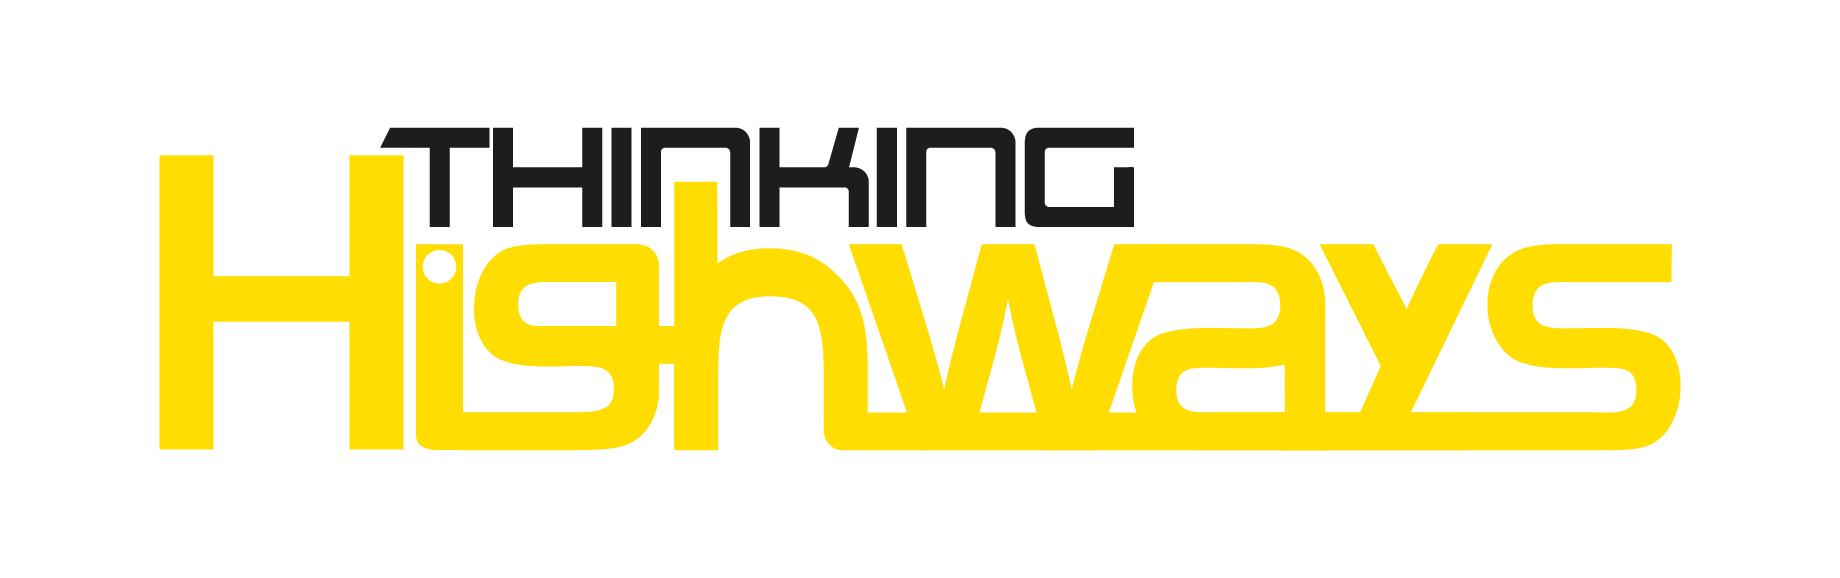 Thinking Highways